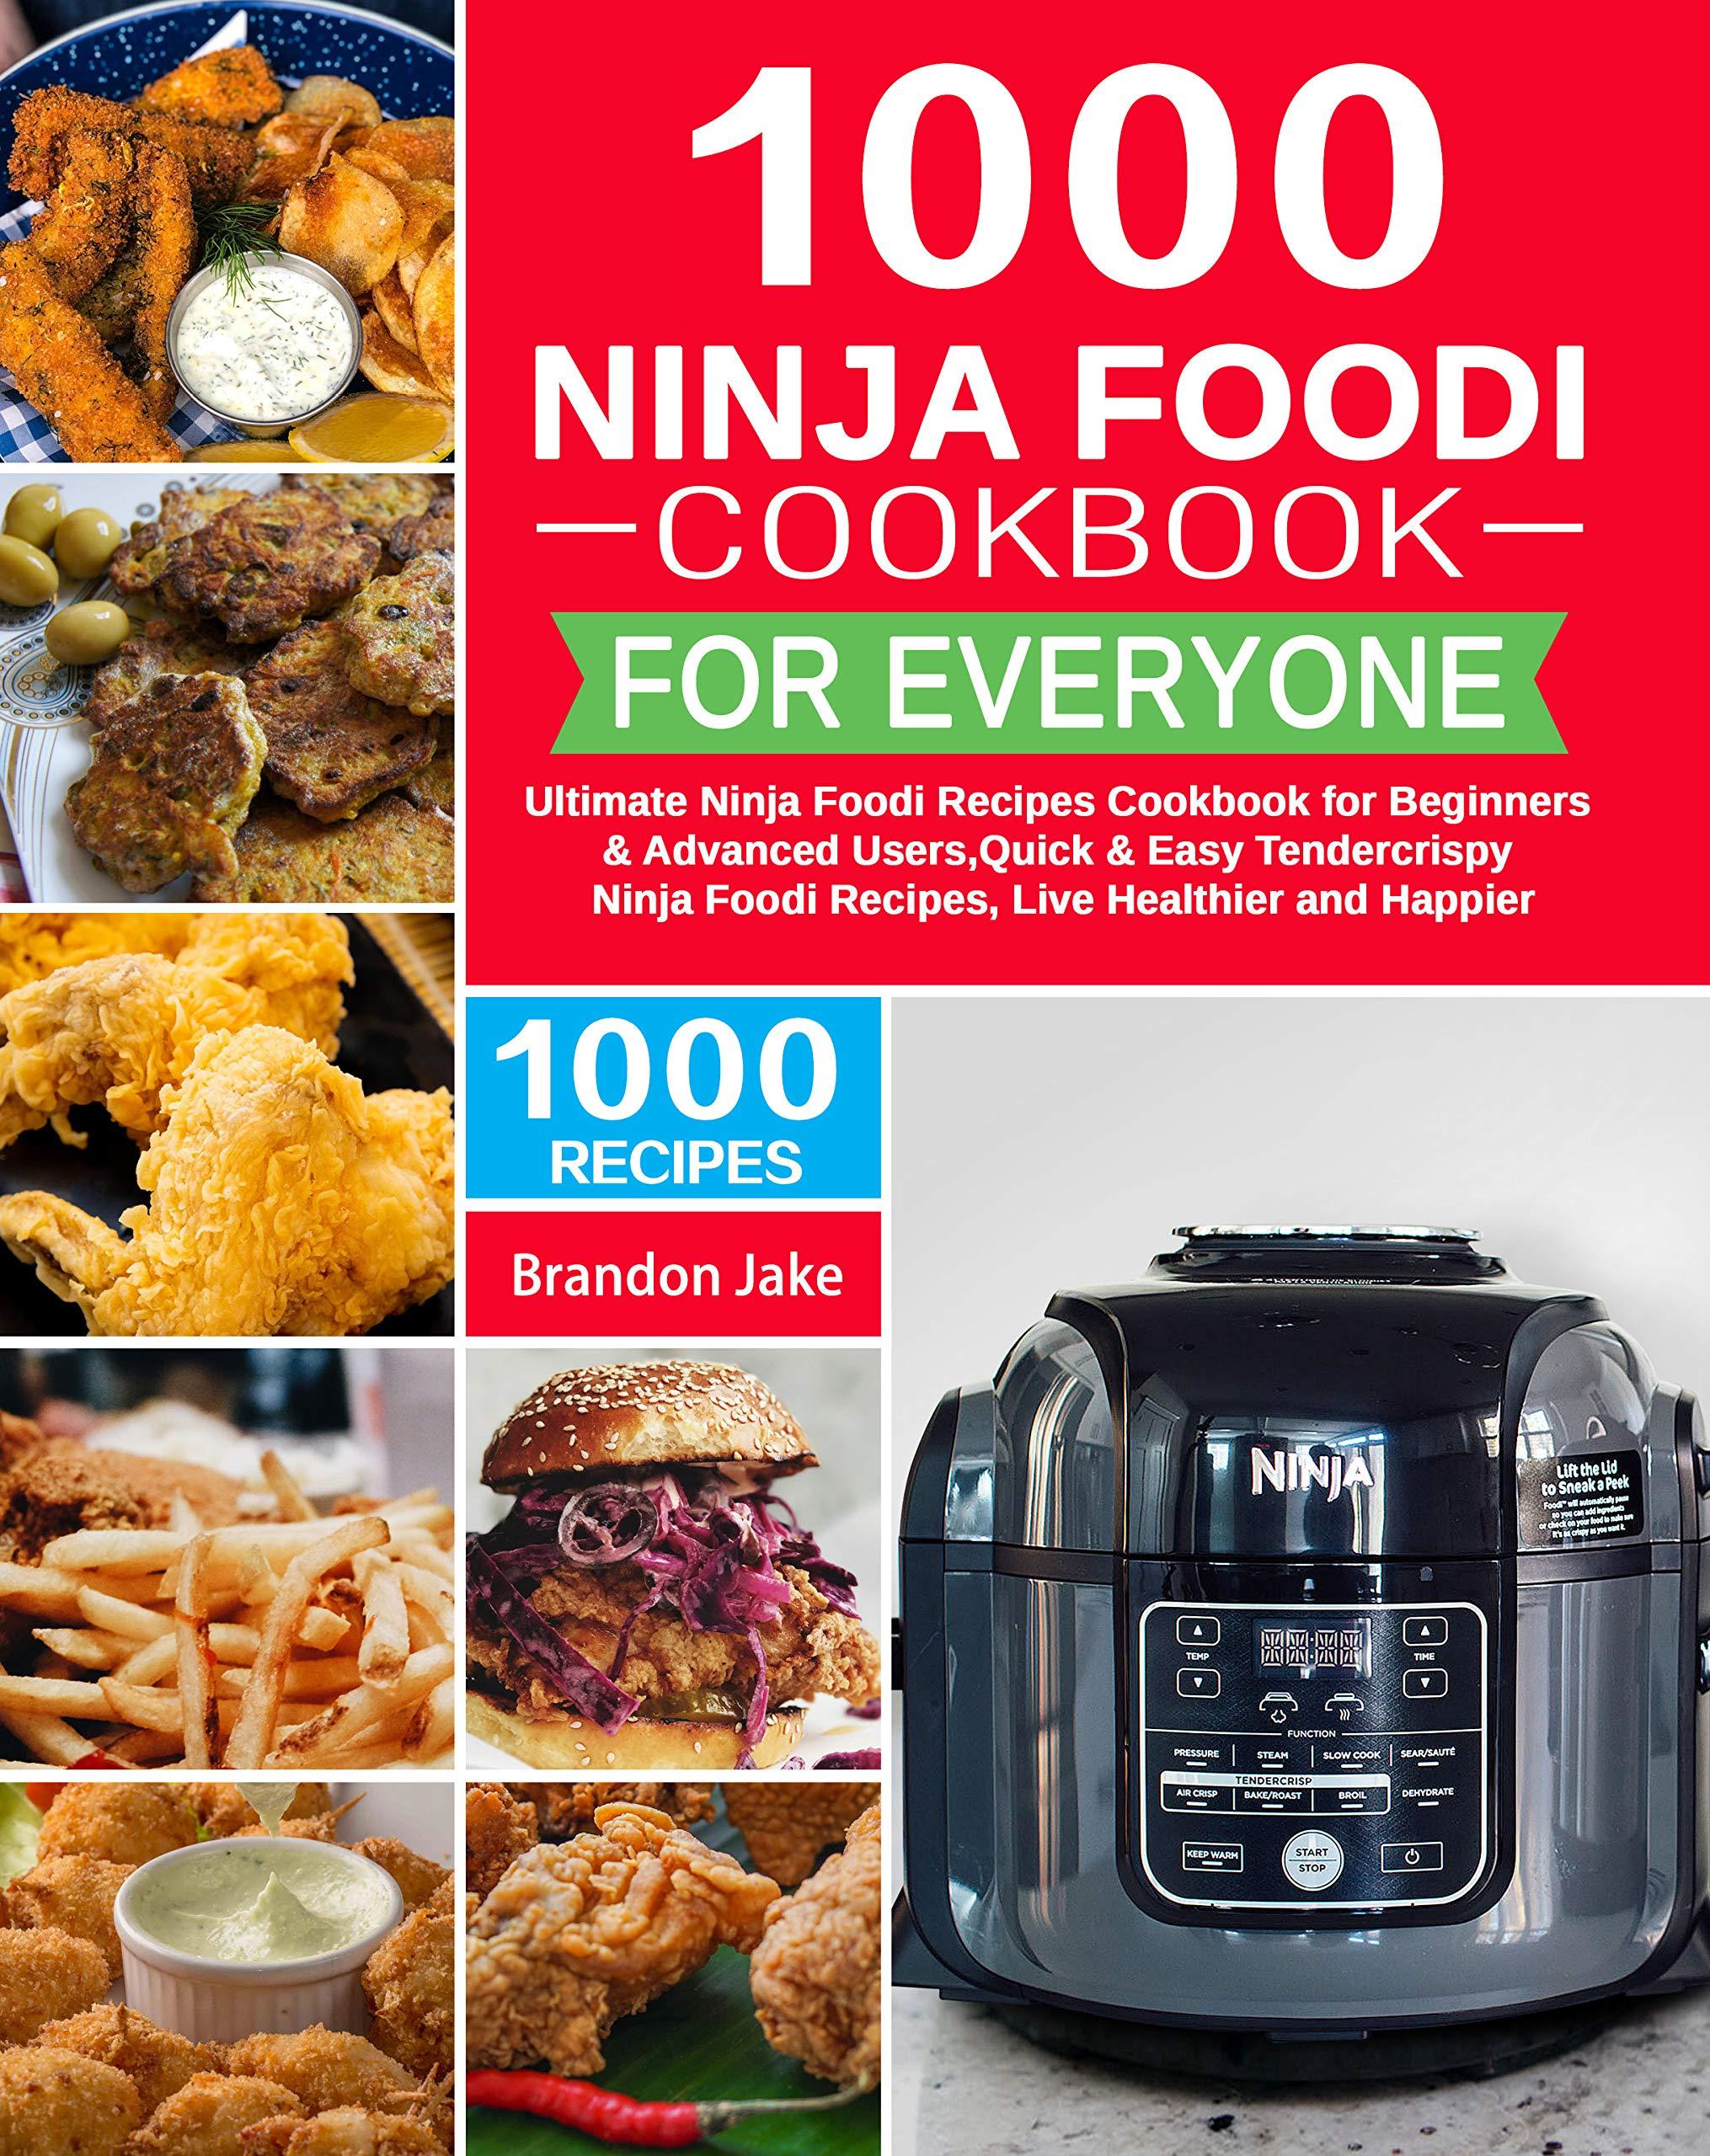 1000 Ninja Foodi Cookbook for Everyone: Ultimate Ninja Foodi Recipes Cookbook for Beginners & Advanced Users,Quick & Easy Tendercrispy Ninja Foodi Recipes, Live Healthier and Happier